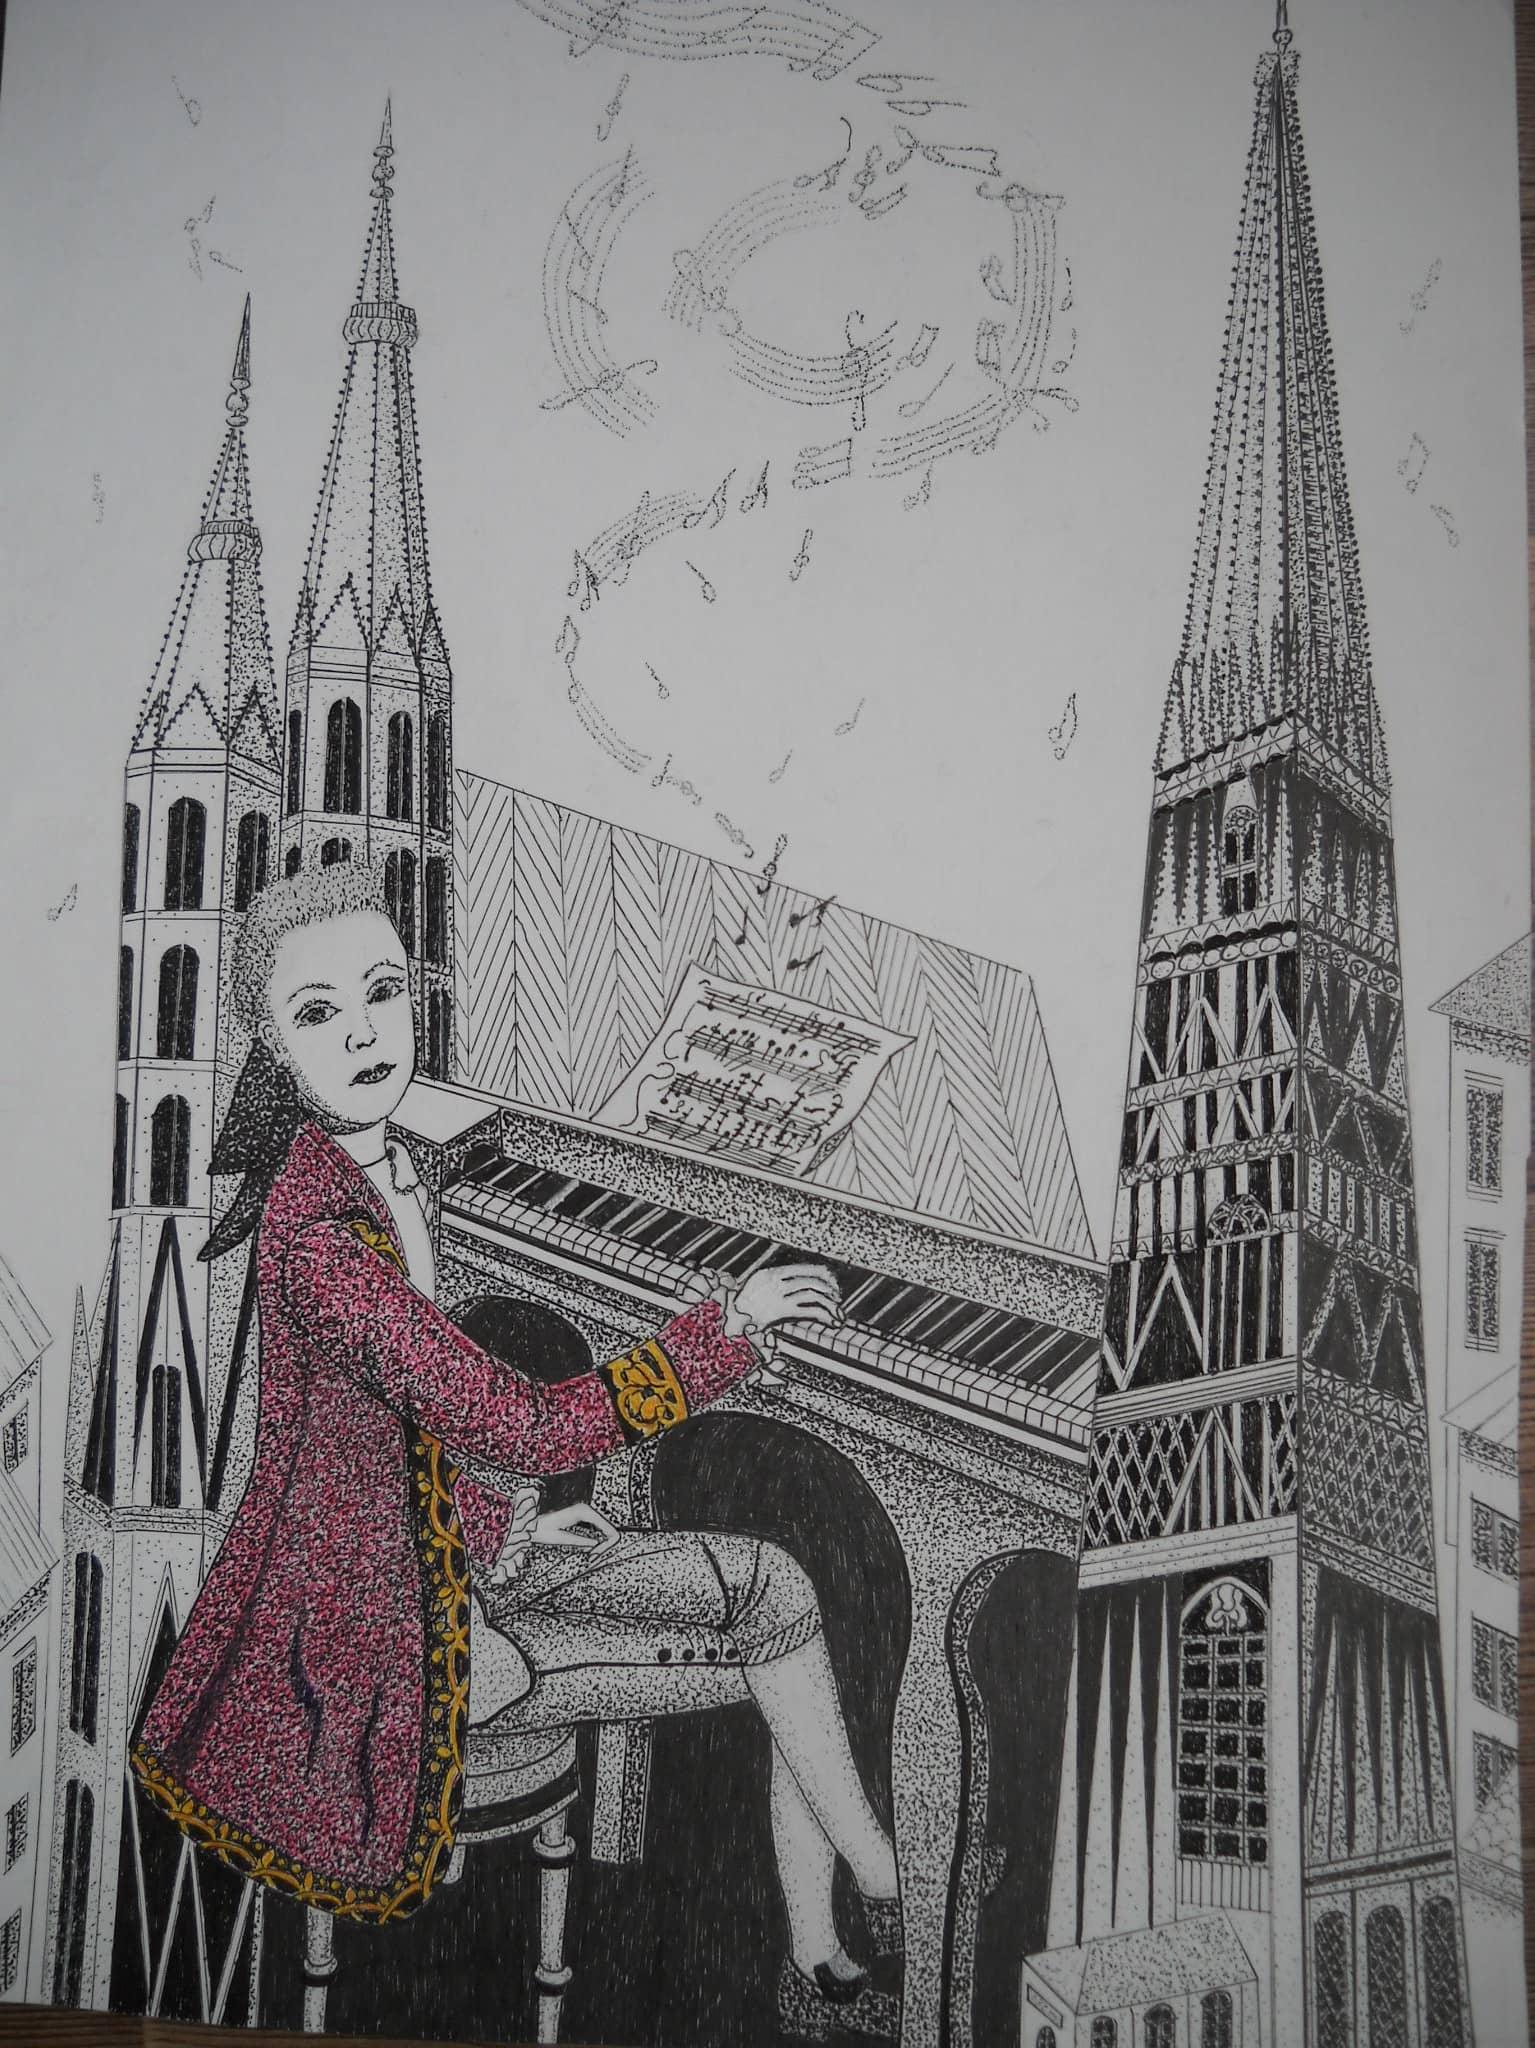 Юный Моцарт в Вене с видом на собор Св. Стефана